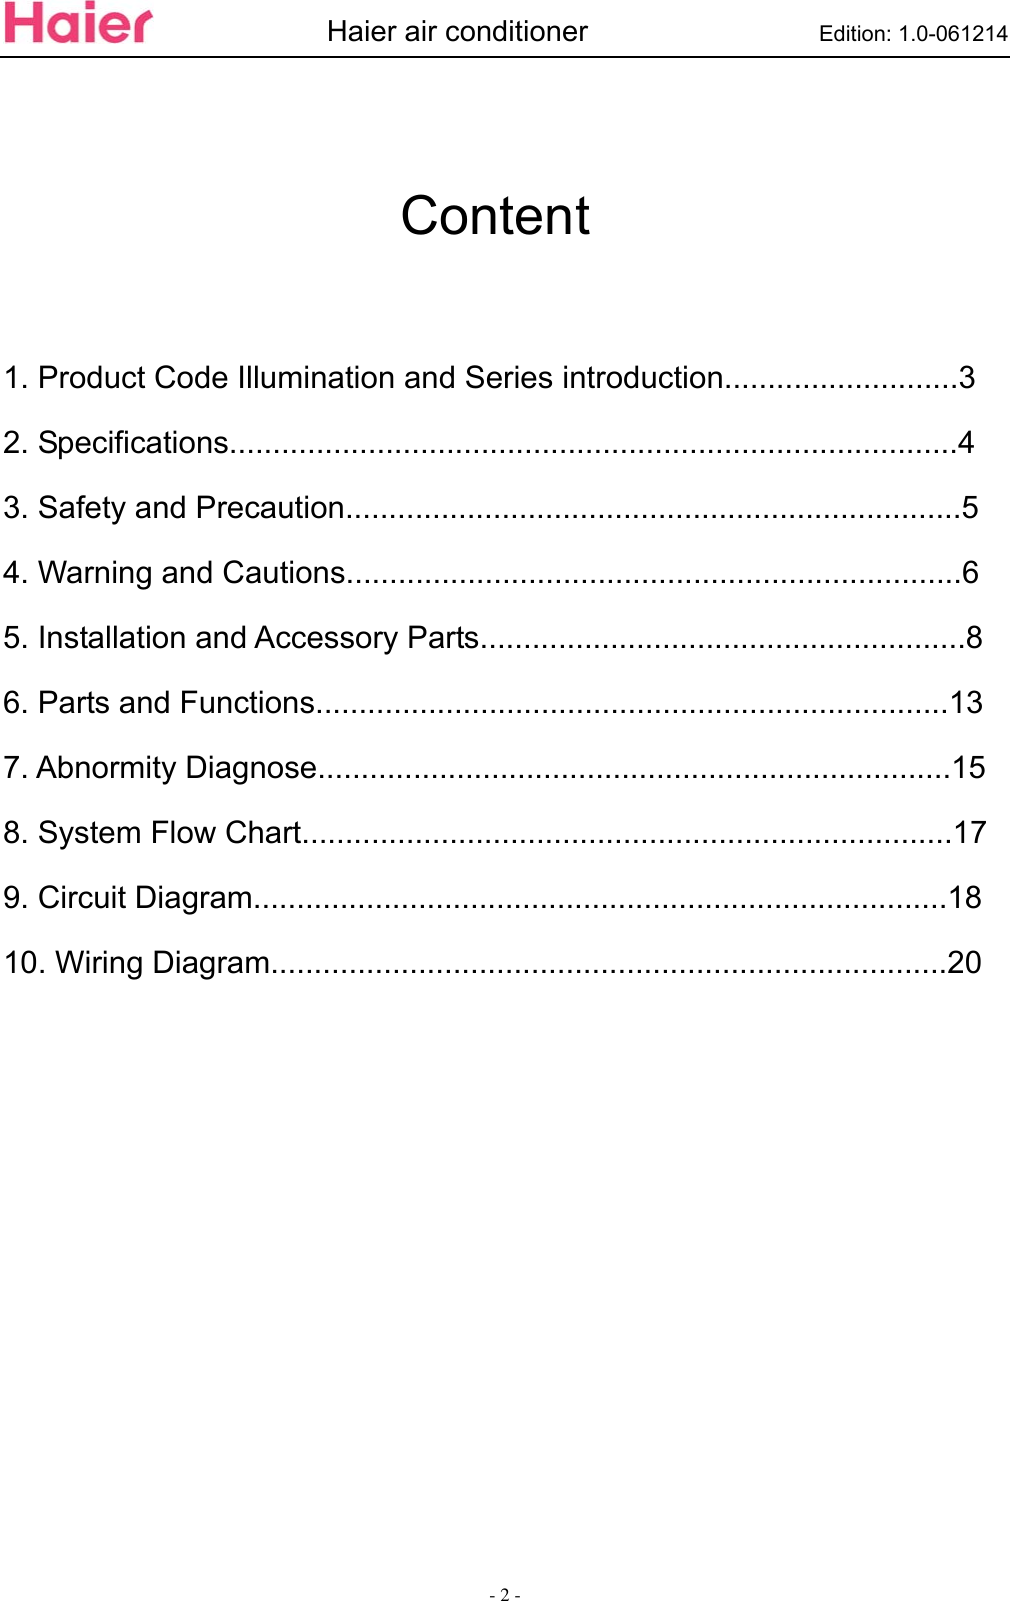 Haier Air Conditioner Esa3087 Users Manual ESA3067 SM_06 11 30_ on